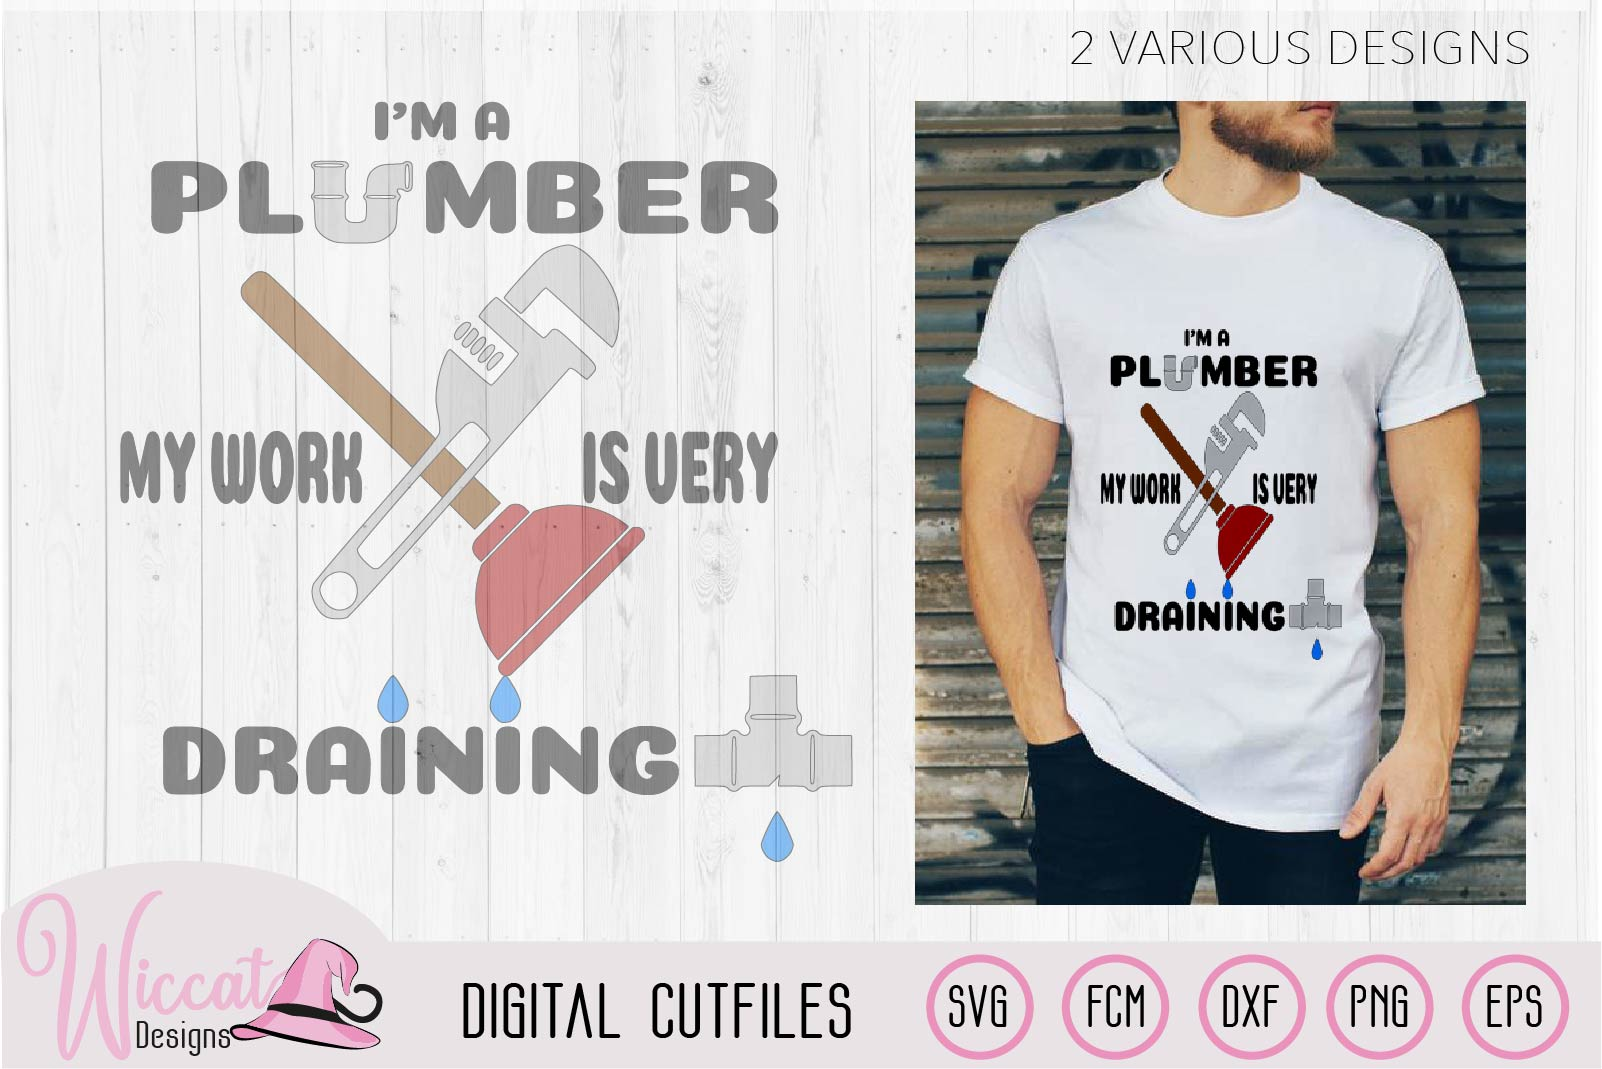 I'm a plumber quote, Plumber pun, plumber tools, man shirt, example image 1